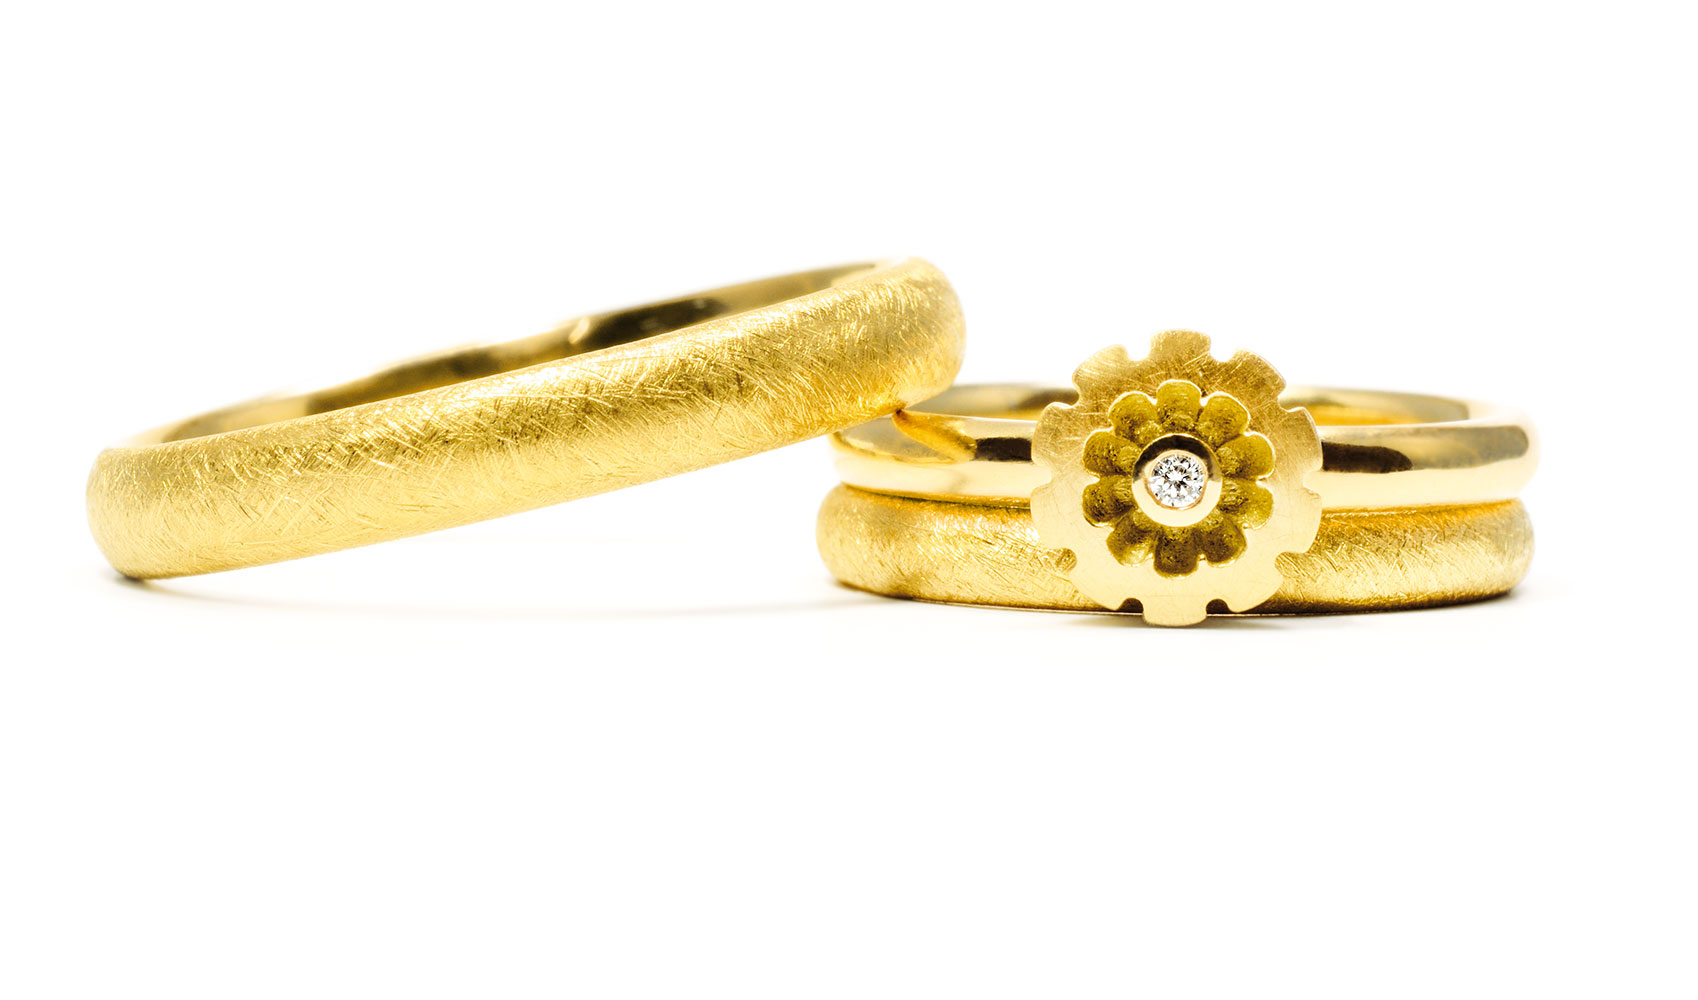 GOLDAFFAIRS - Individuelle Ringe / Trauringe aus ökofairem Gold